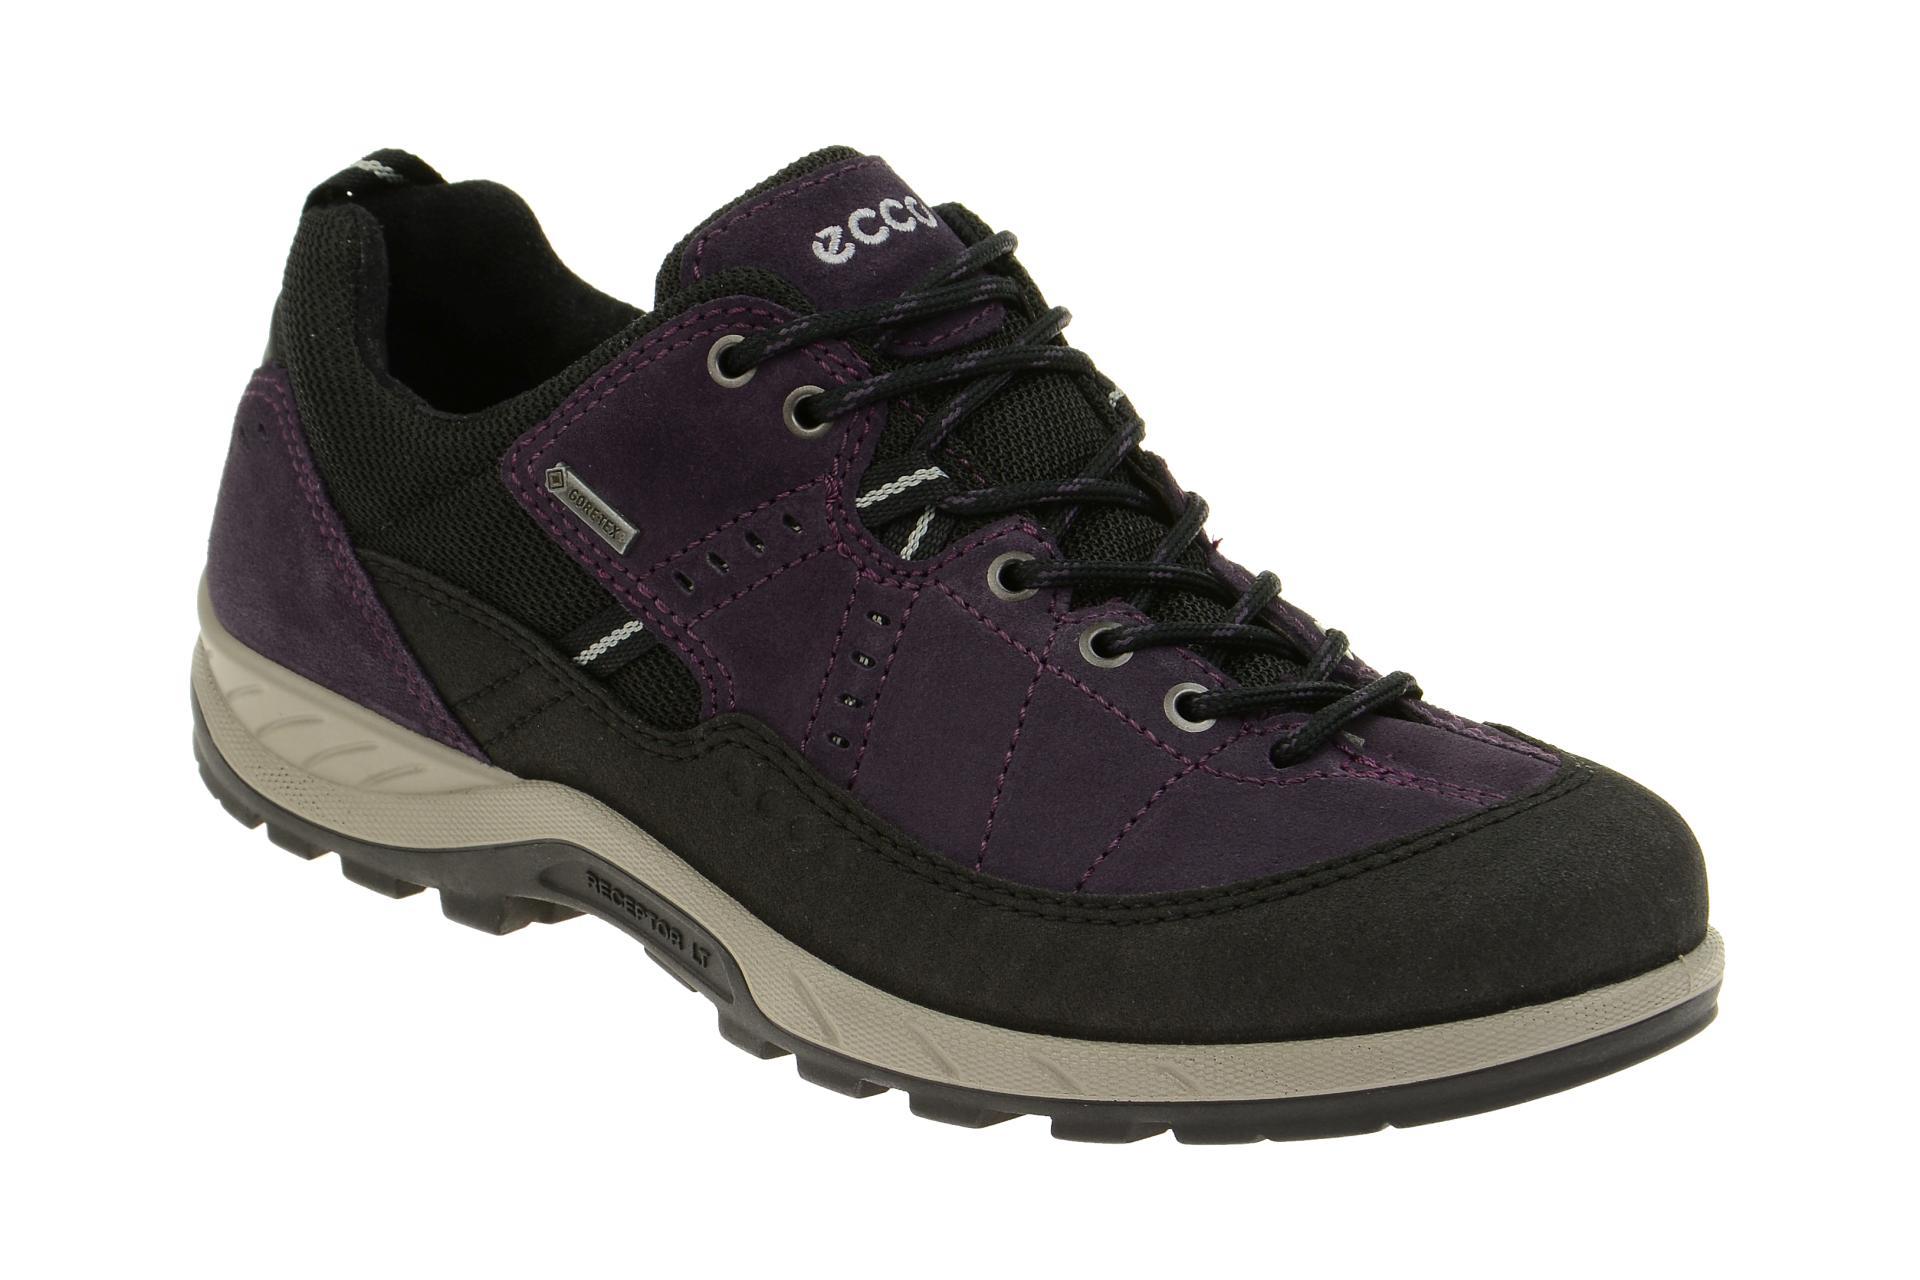 97d4e3d1af23e4 Ecco Yura Schuhe schwarz lila Gore-Tex - 84060356343 - Schuhhaus Strauch  Shop